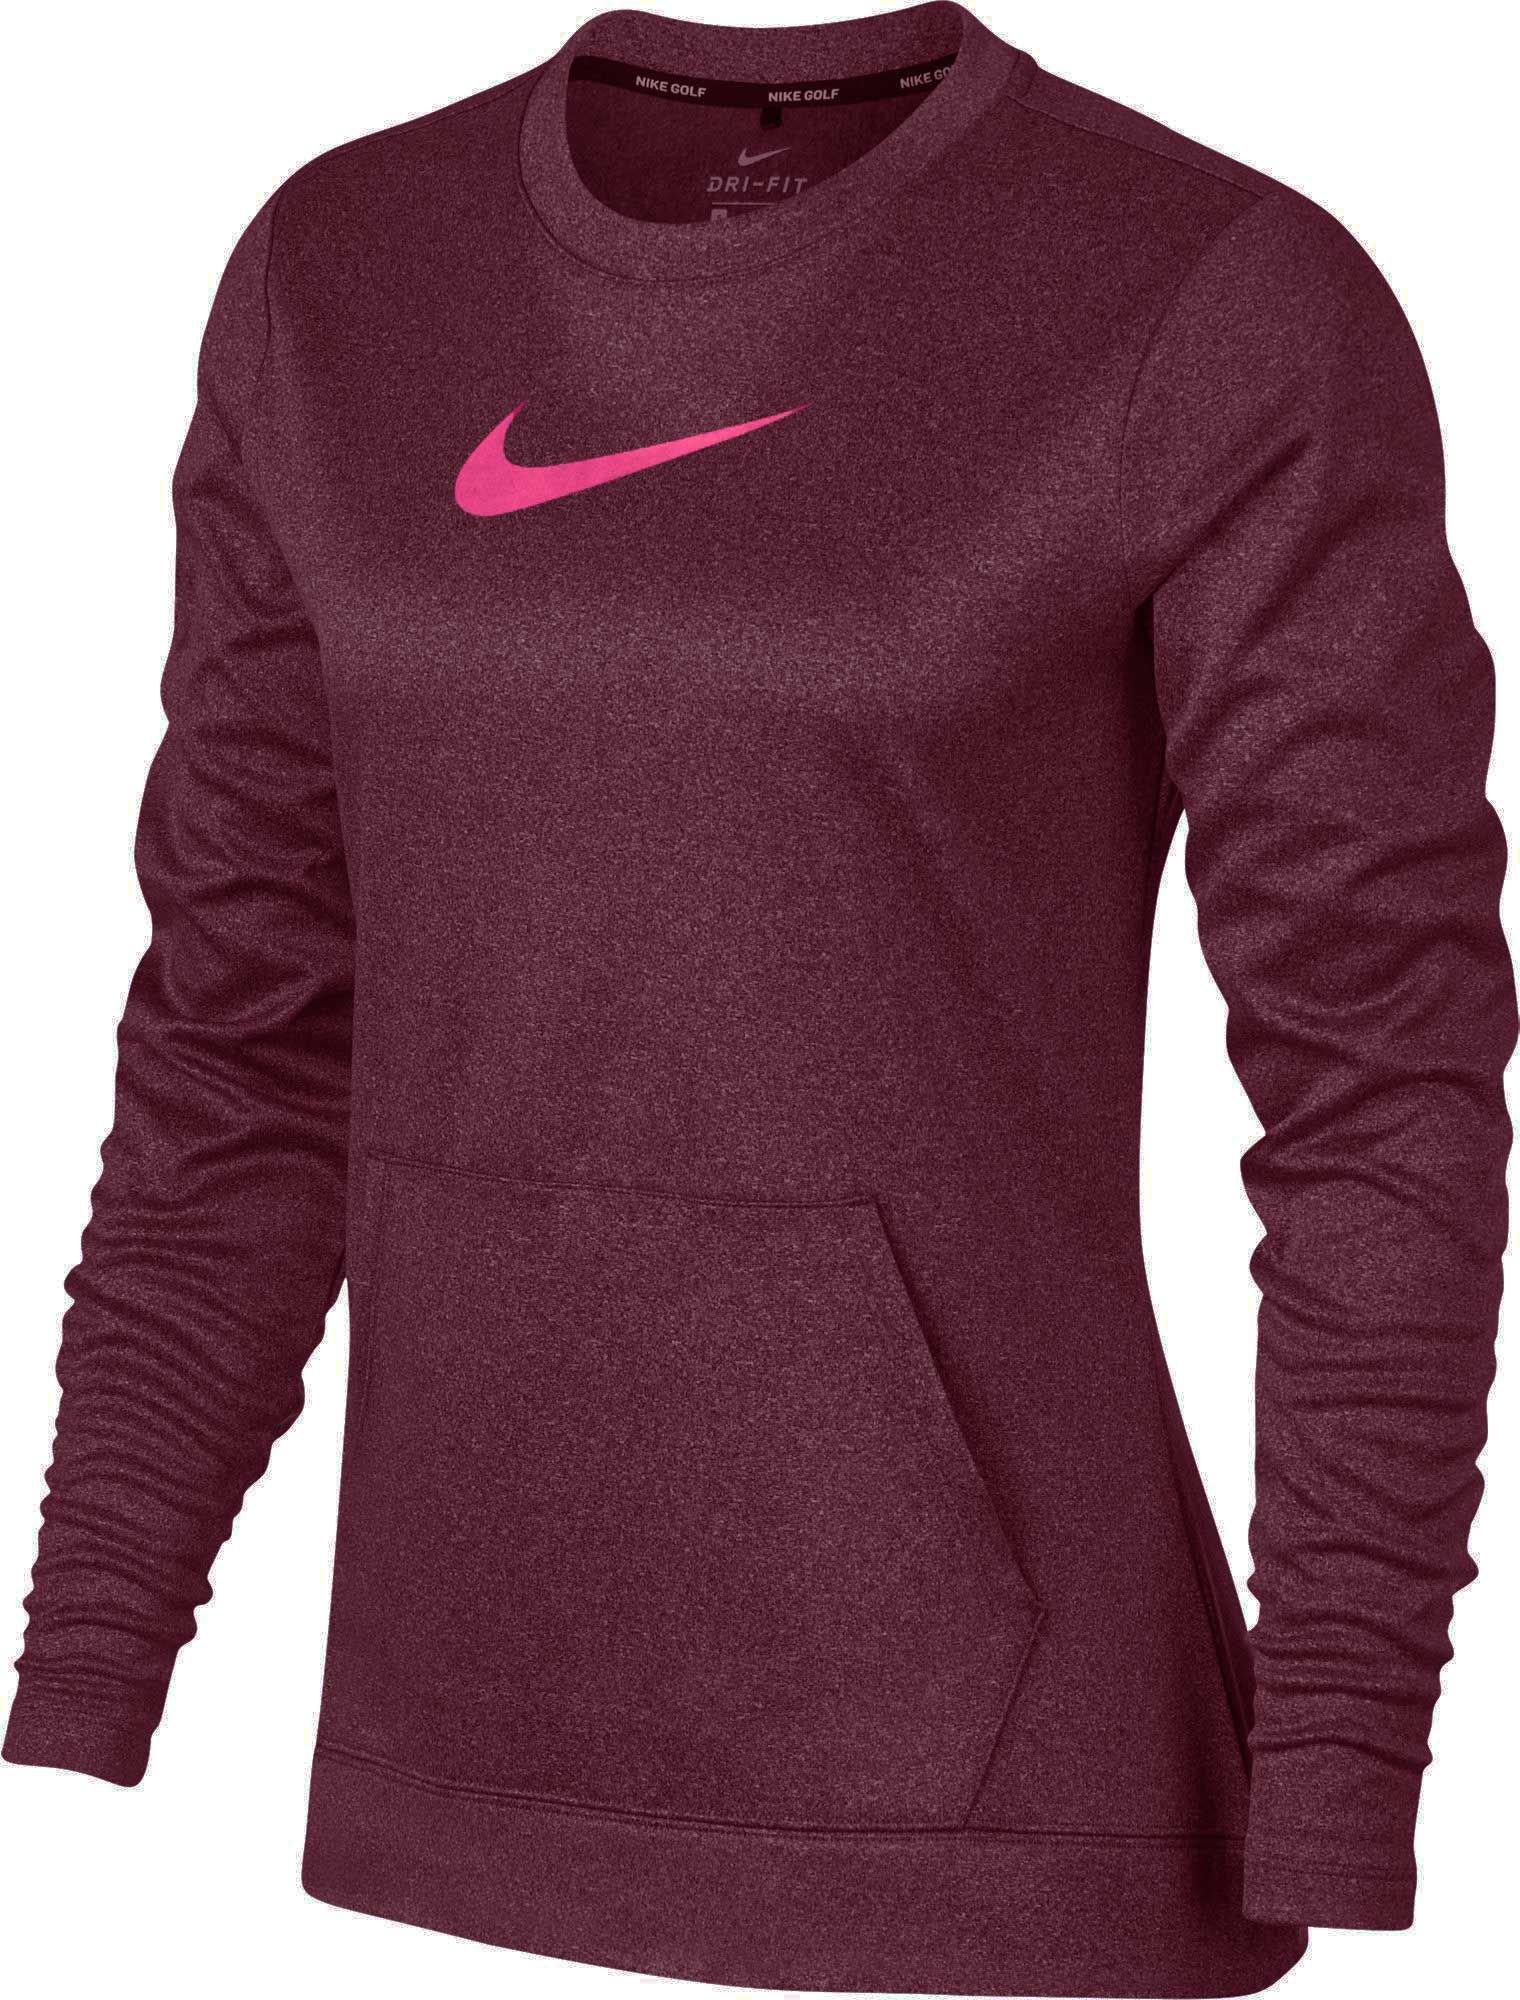 Nike Women's Therma Golf Top (Bordeaux/Hyper Pink, XL)